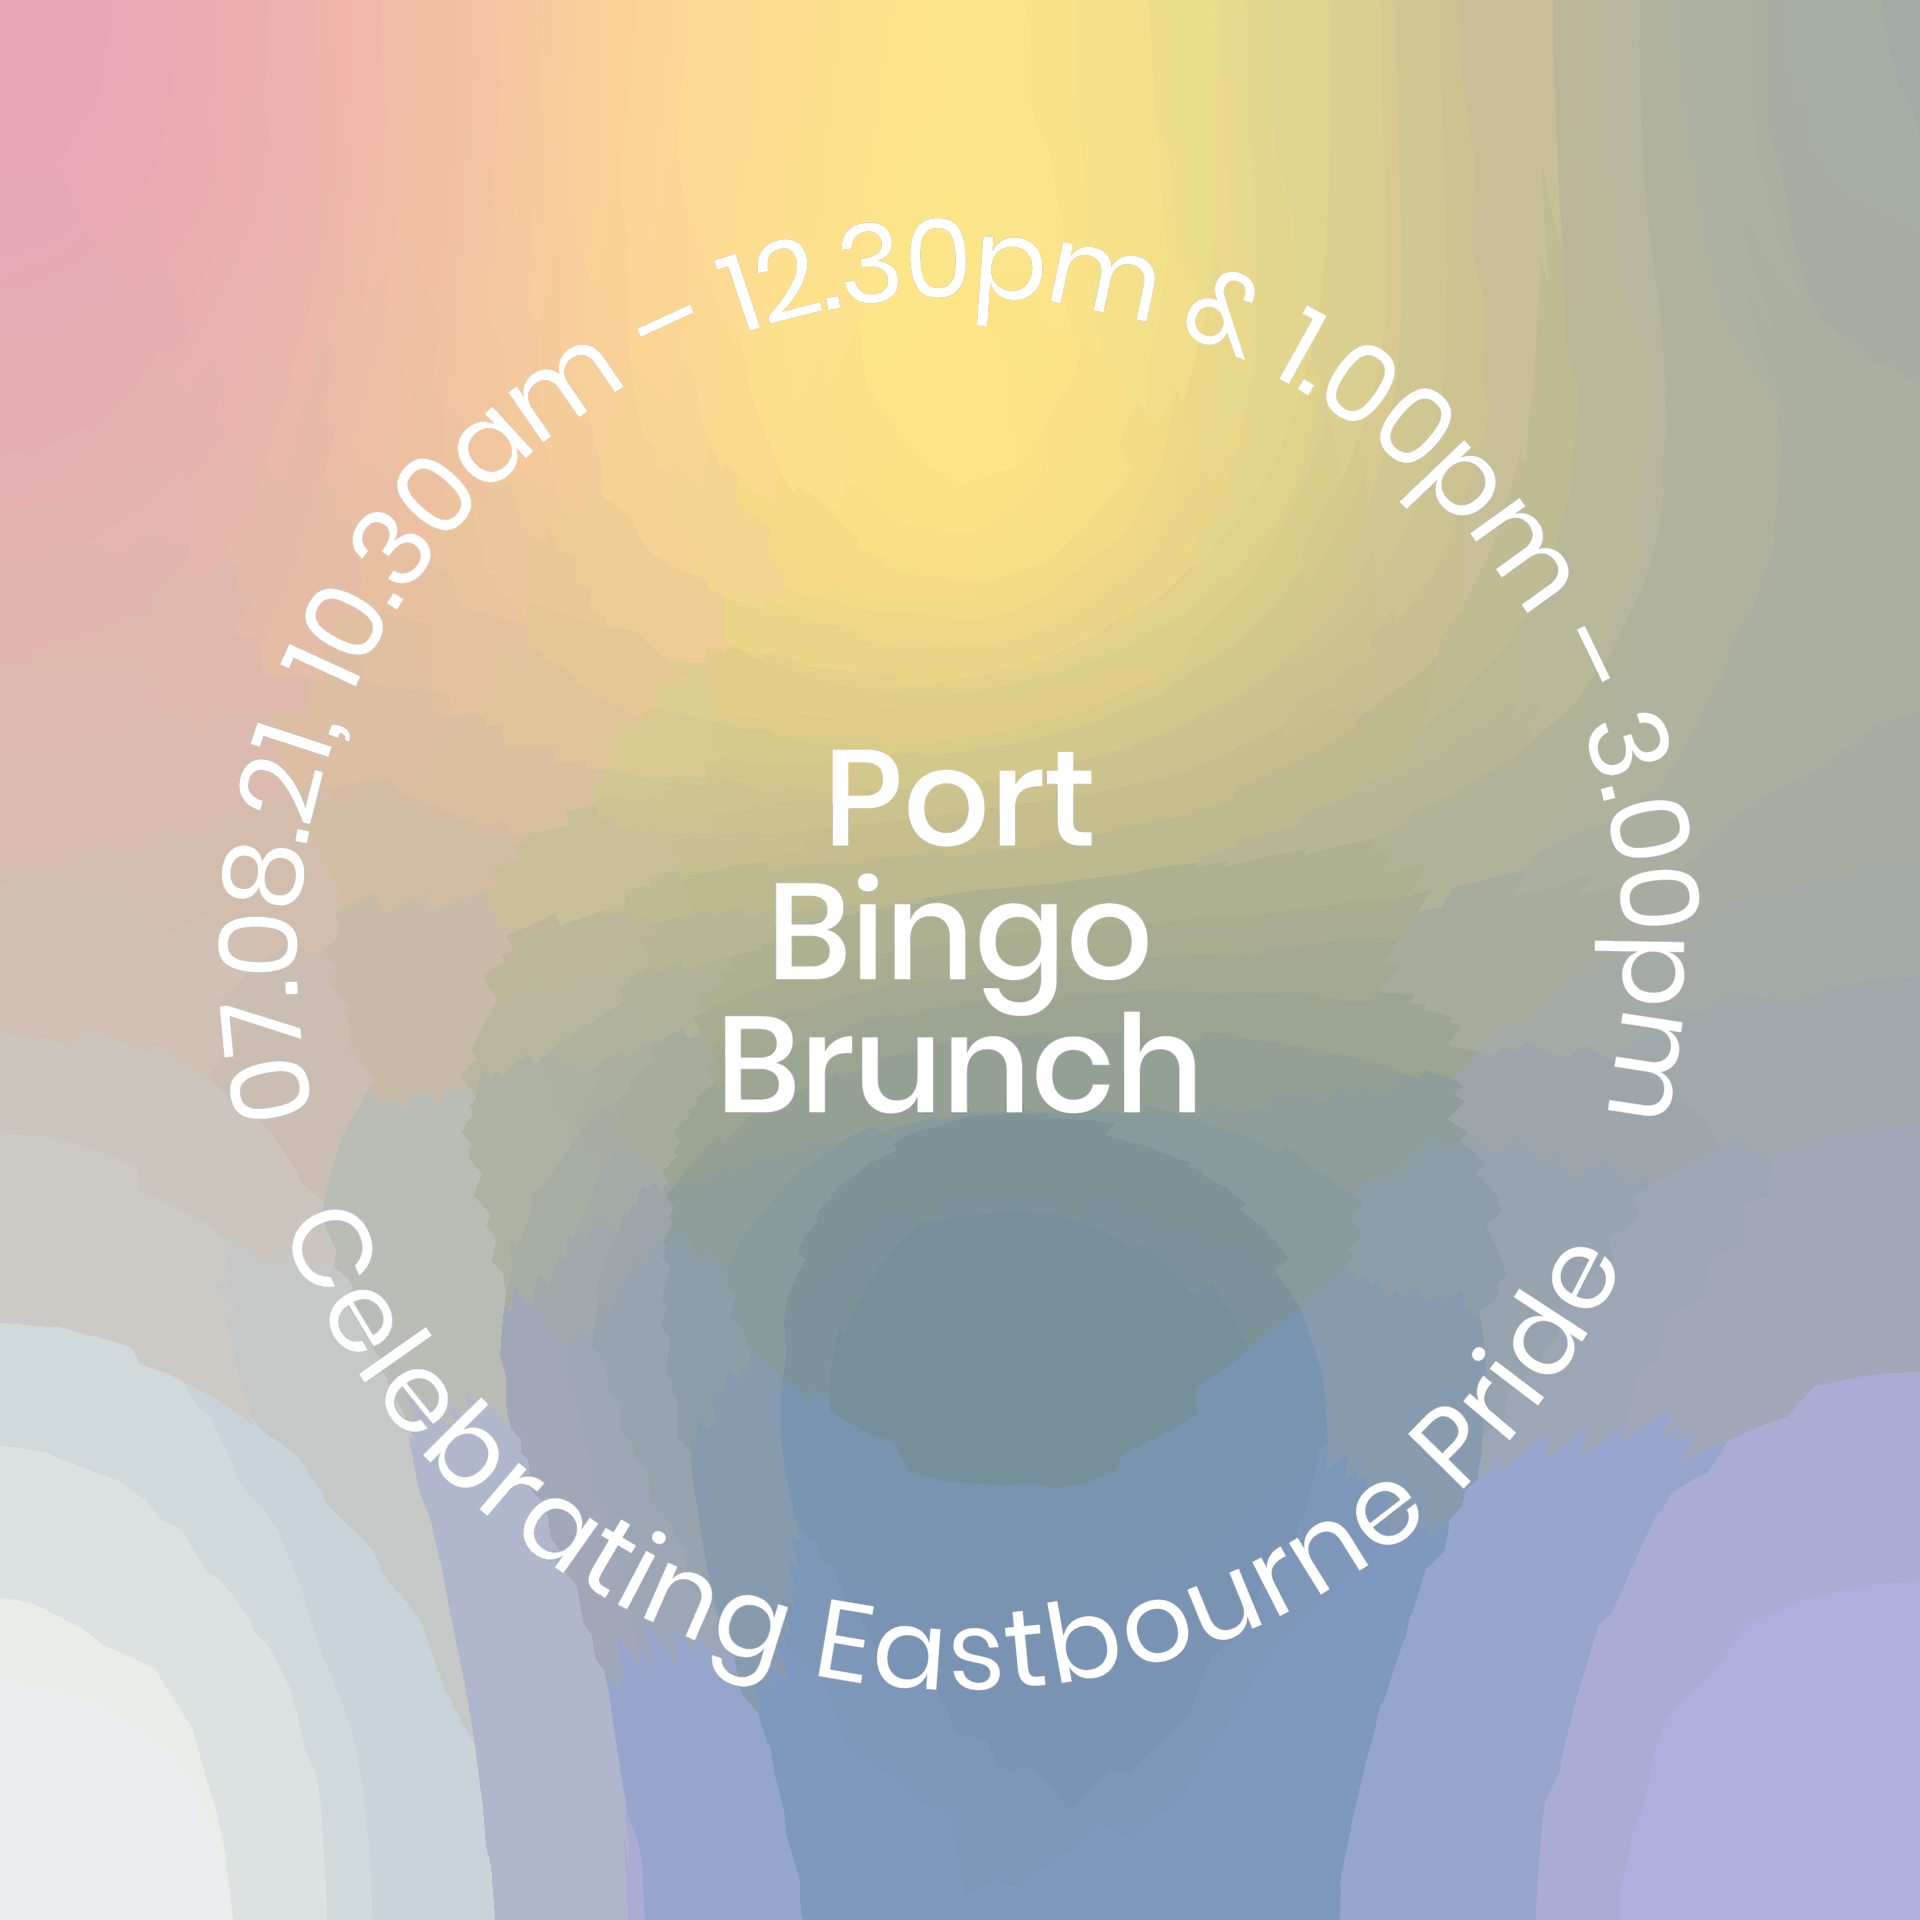 Port Bingo Brunch - Eastbourne Pride event